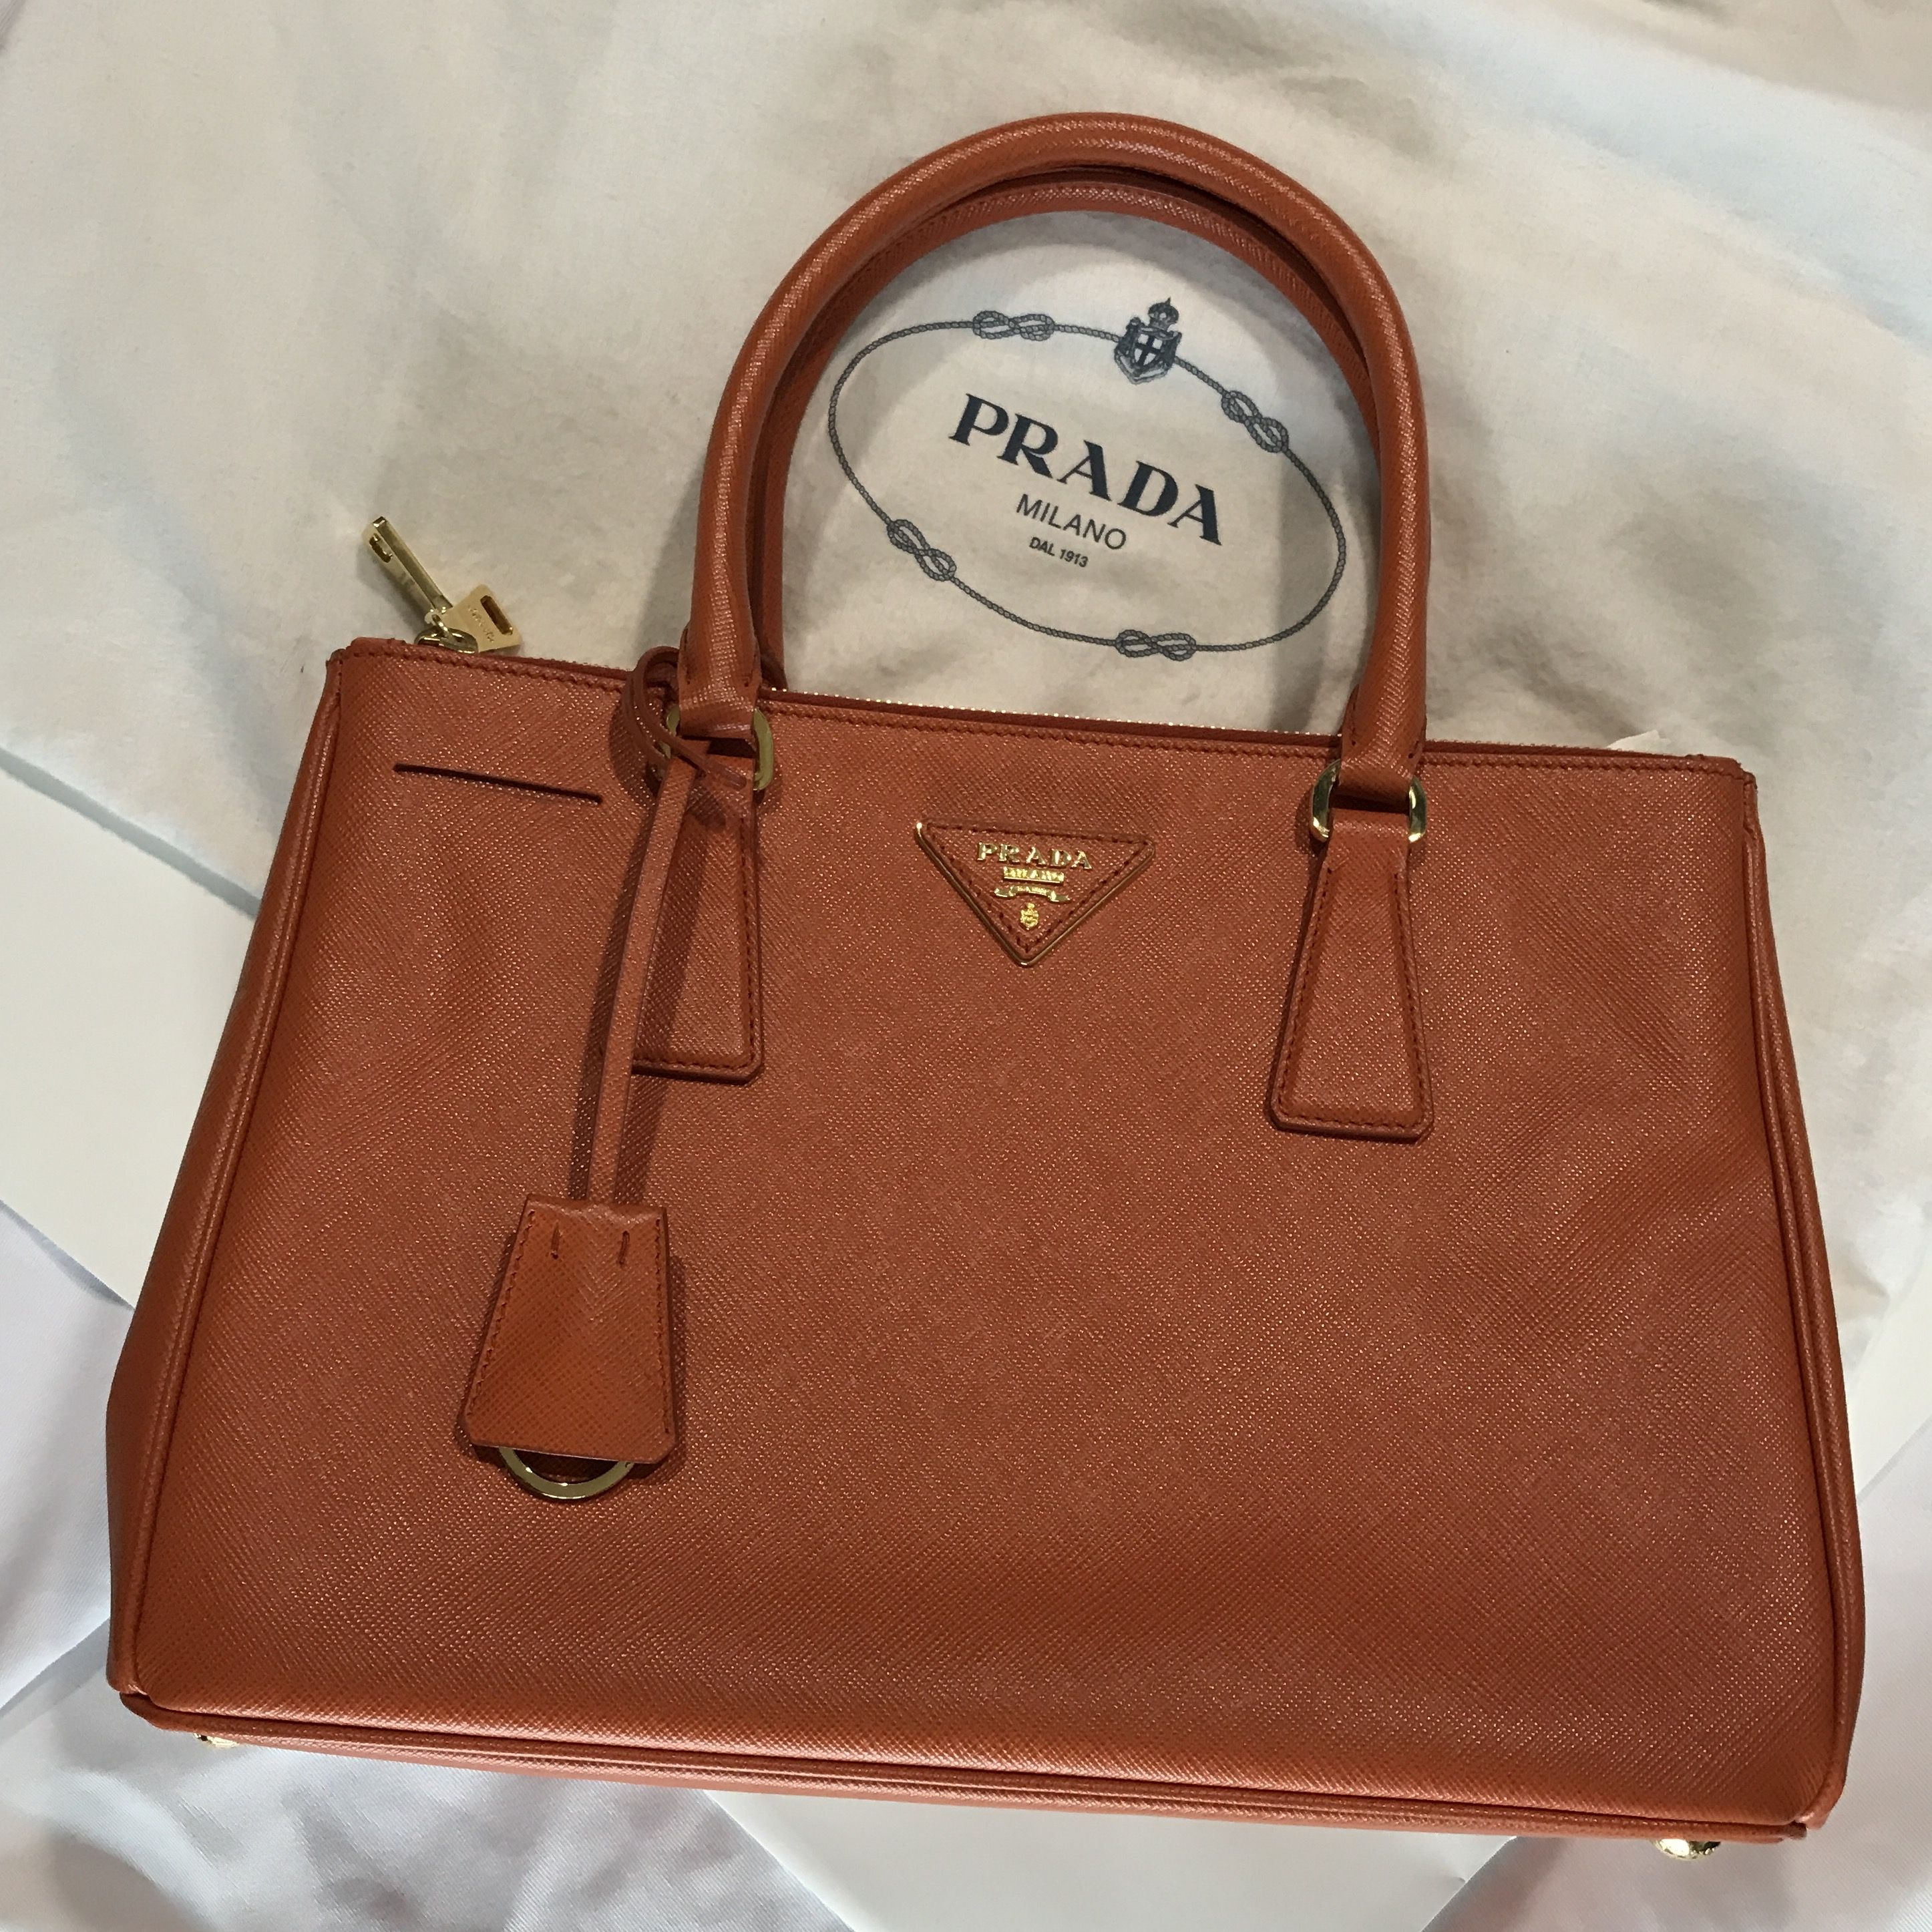 grande vendita c0148 c0c34 Prada Borsa A Mano Saffiano Lux in Papaya ❤️ | Bags! Bags ...